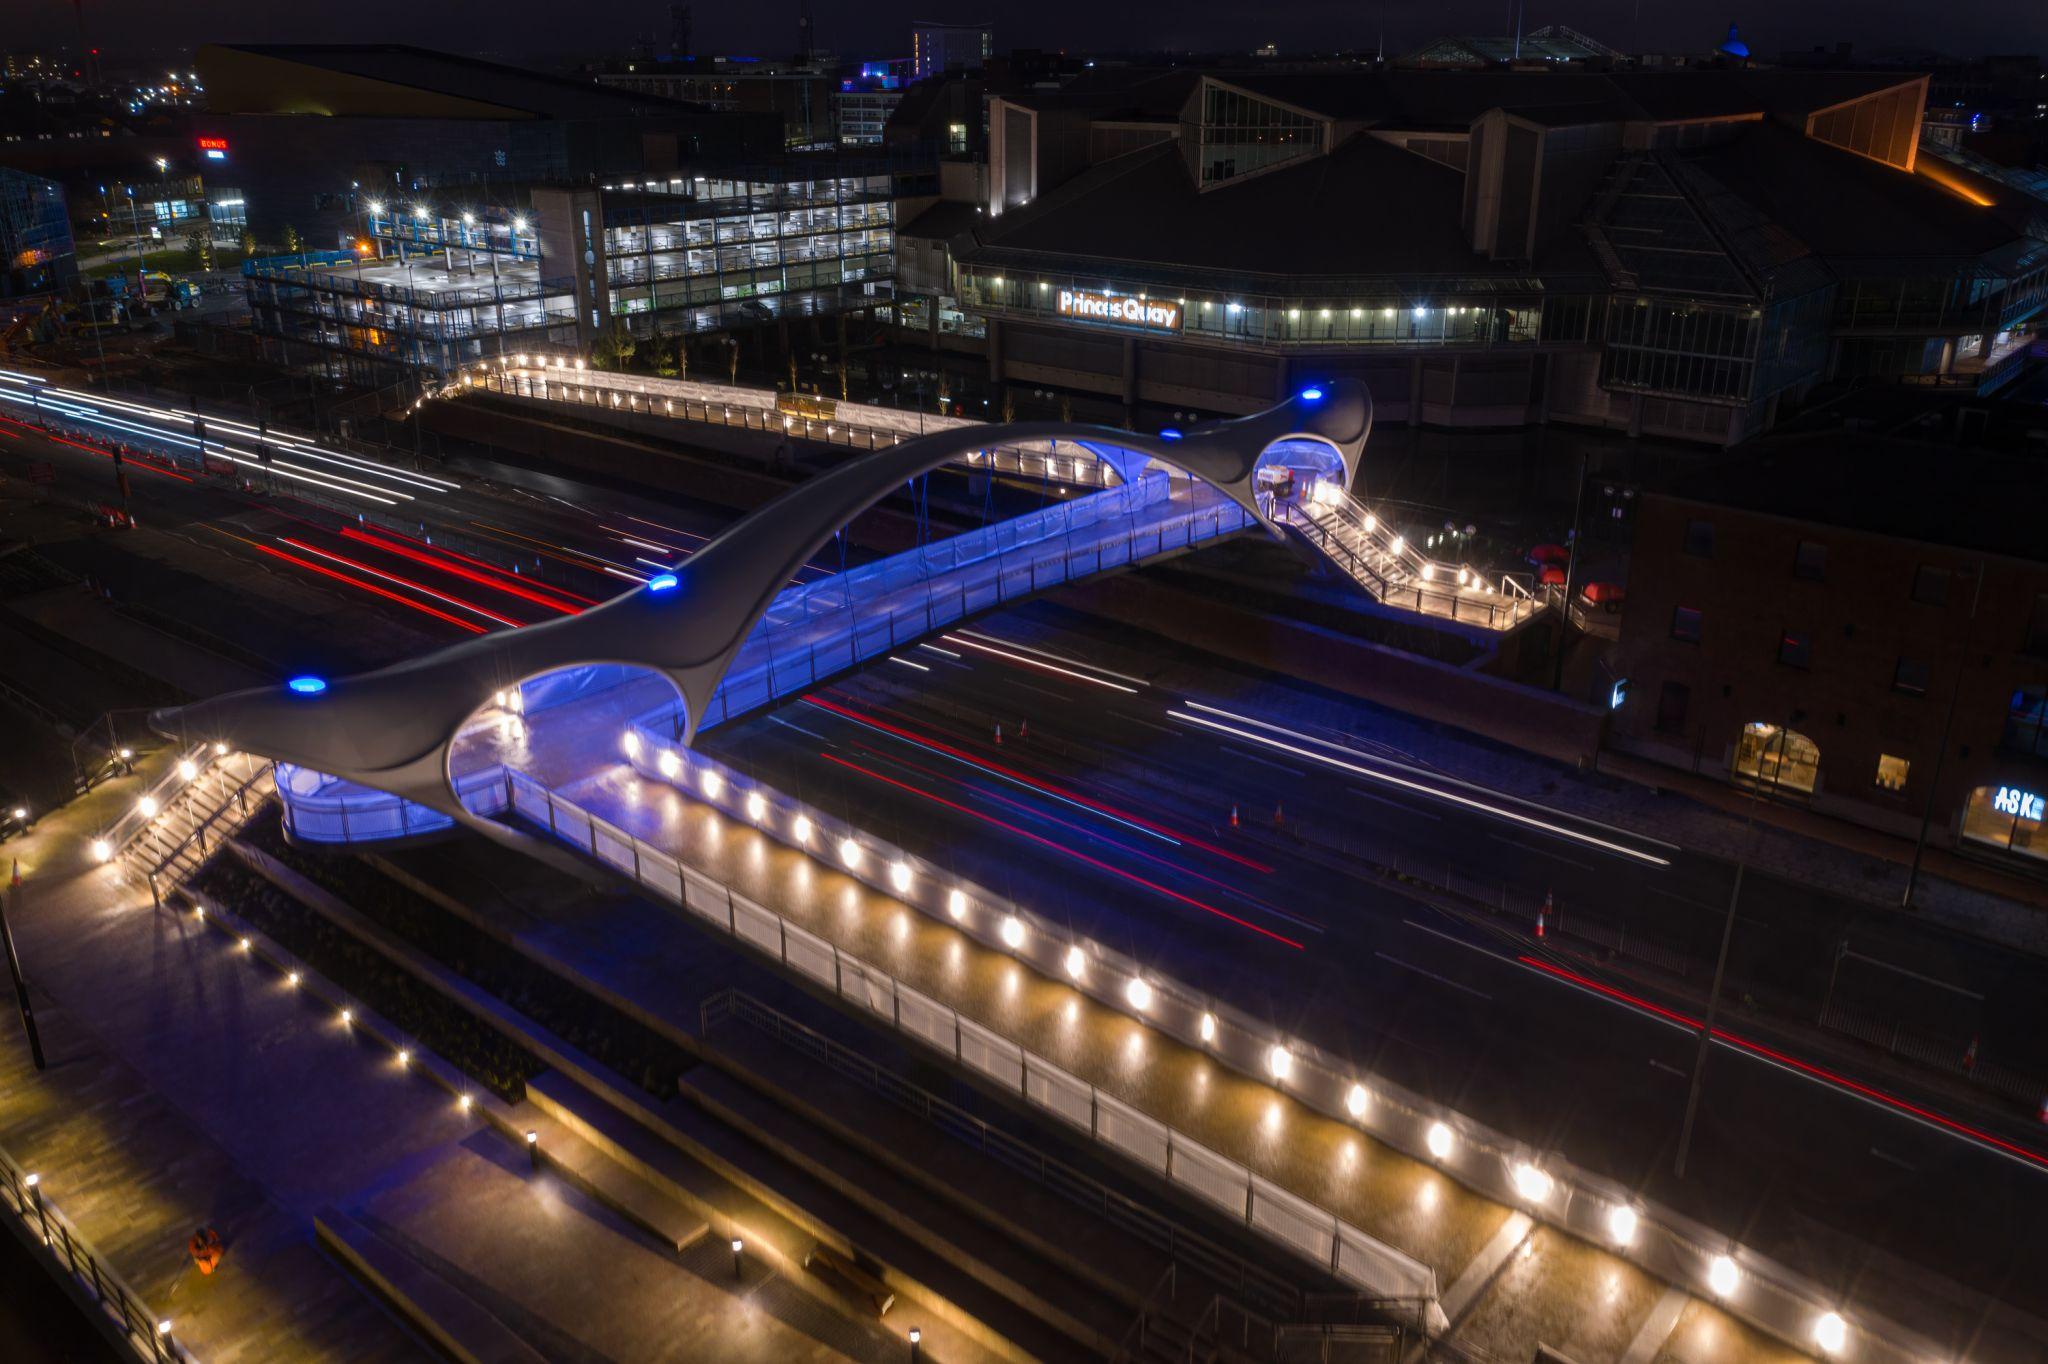 LTP illuminates A63 Princes Quay Bridge / Murdoch's Connection in Hull